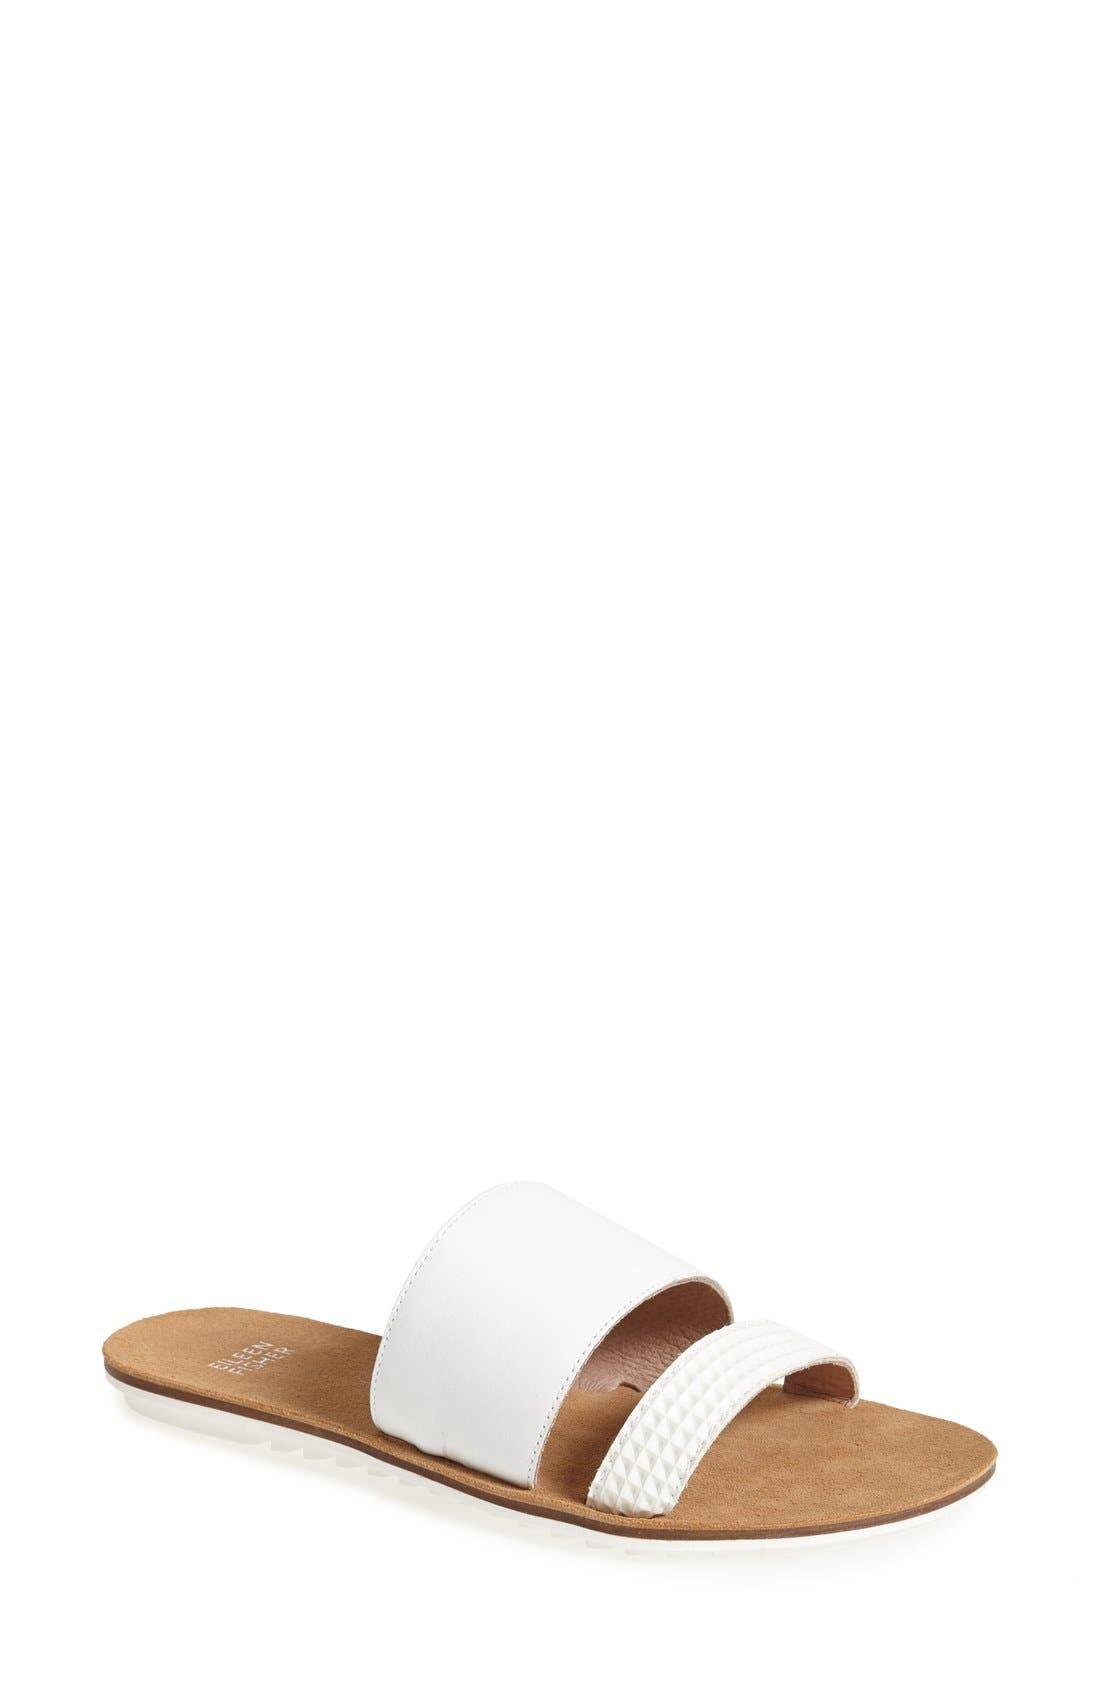 Alternate Image 1 Selected - Eileen Fisher 'Folly' Leather Sandal (Women)